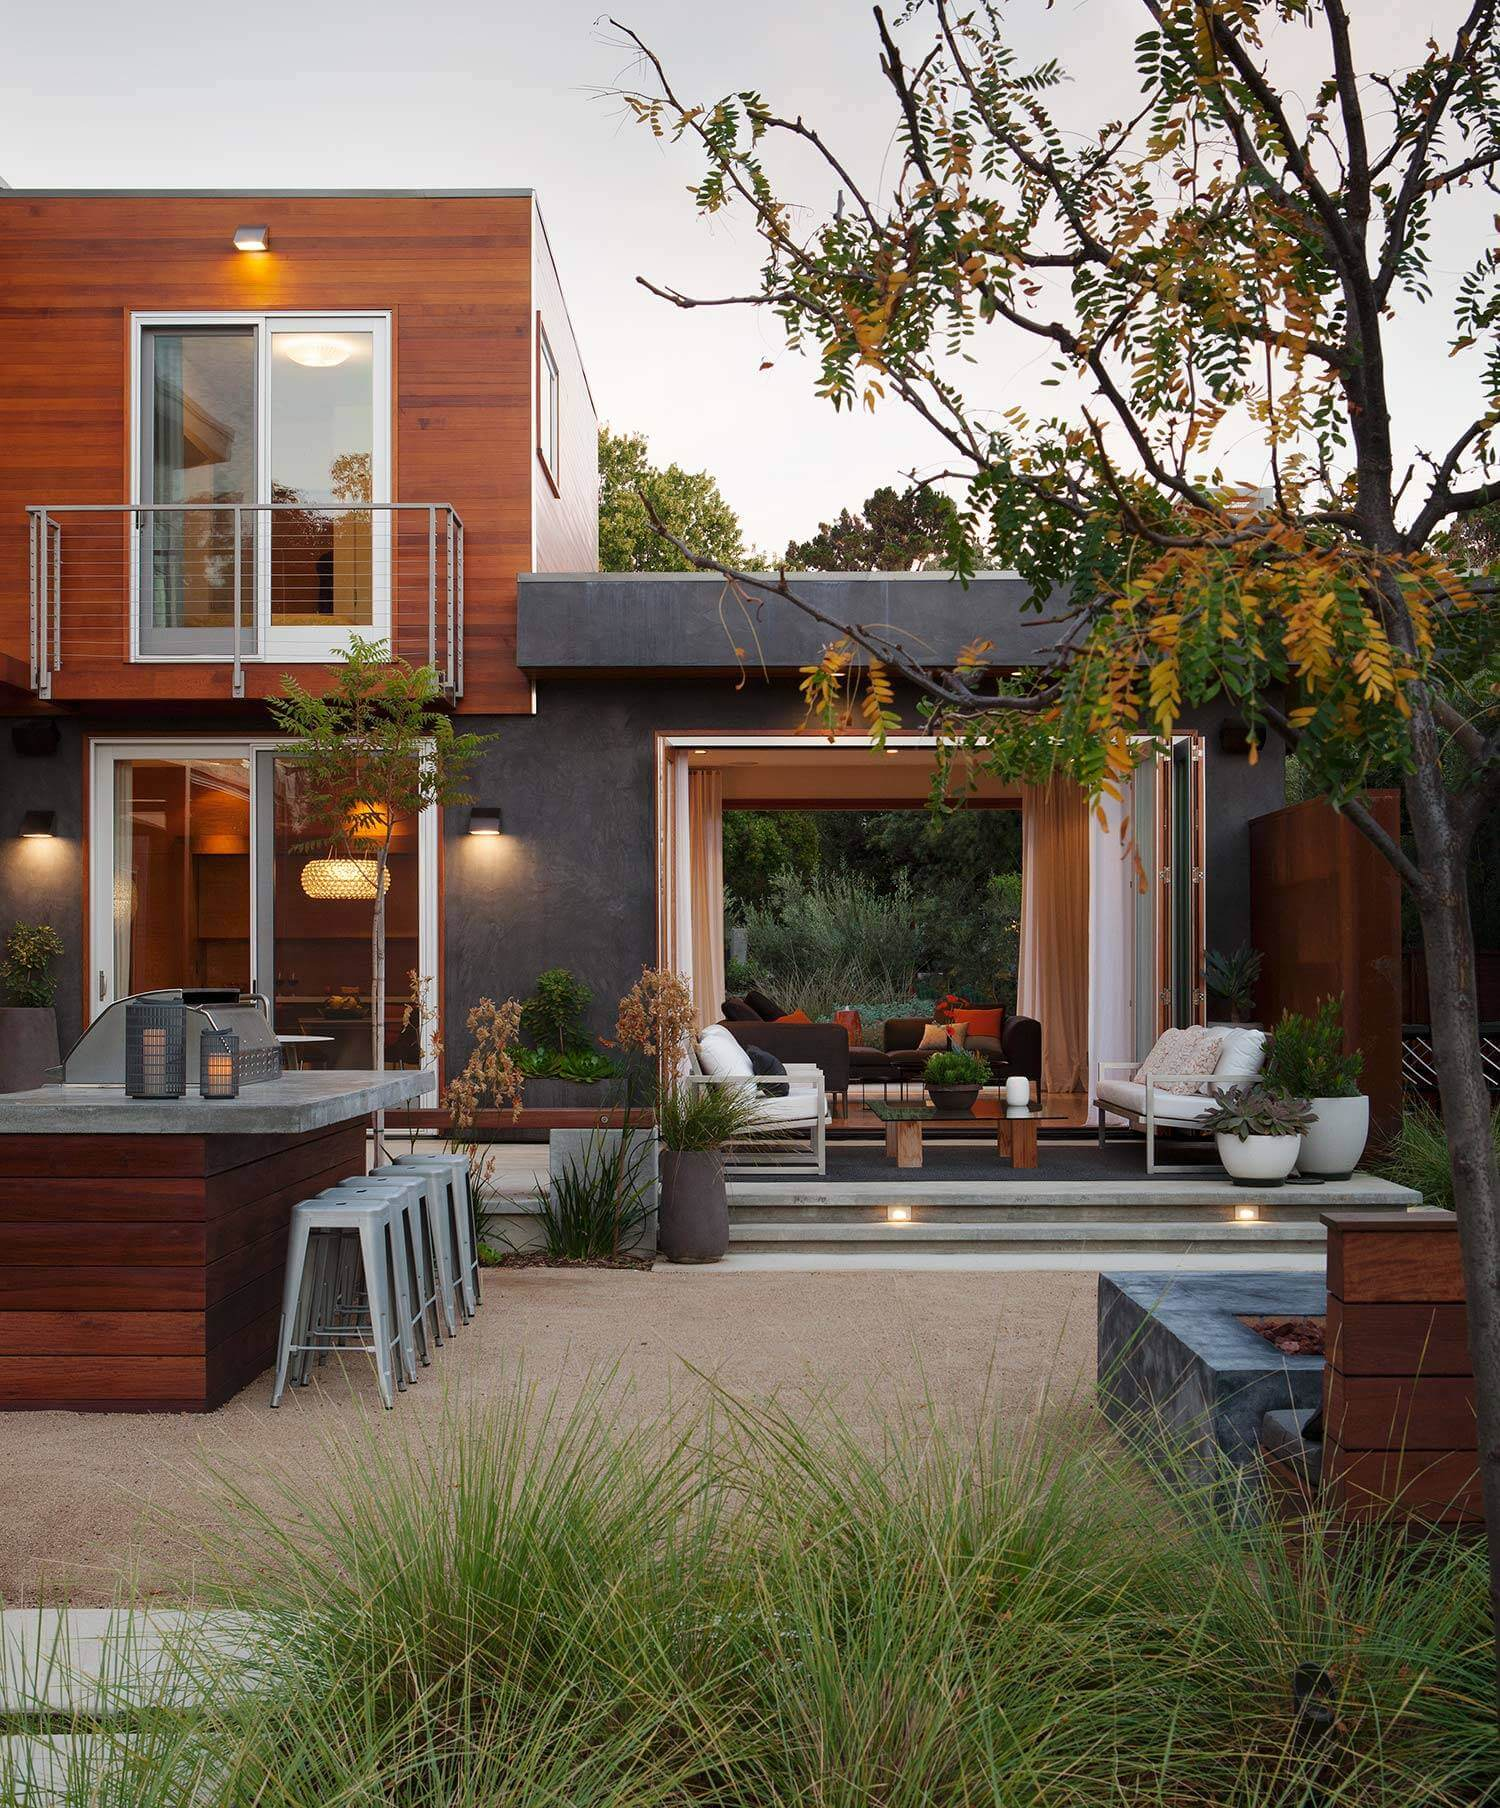 los-altos-house-dotter-solfjeld-architecture-14